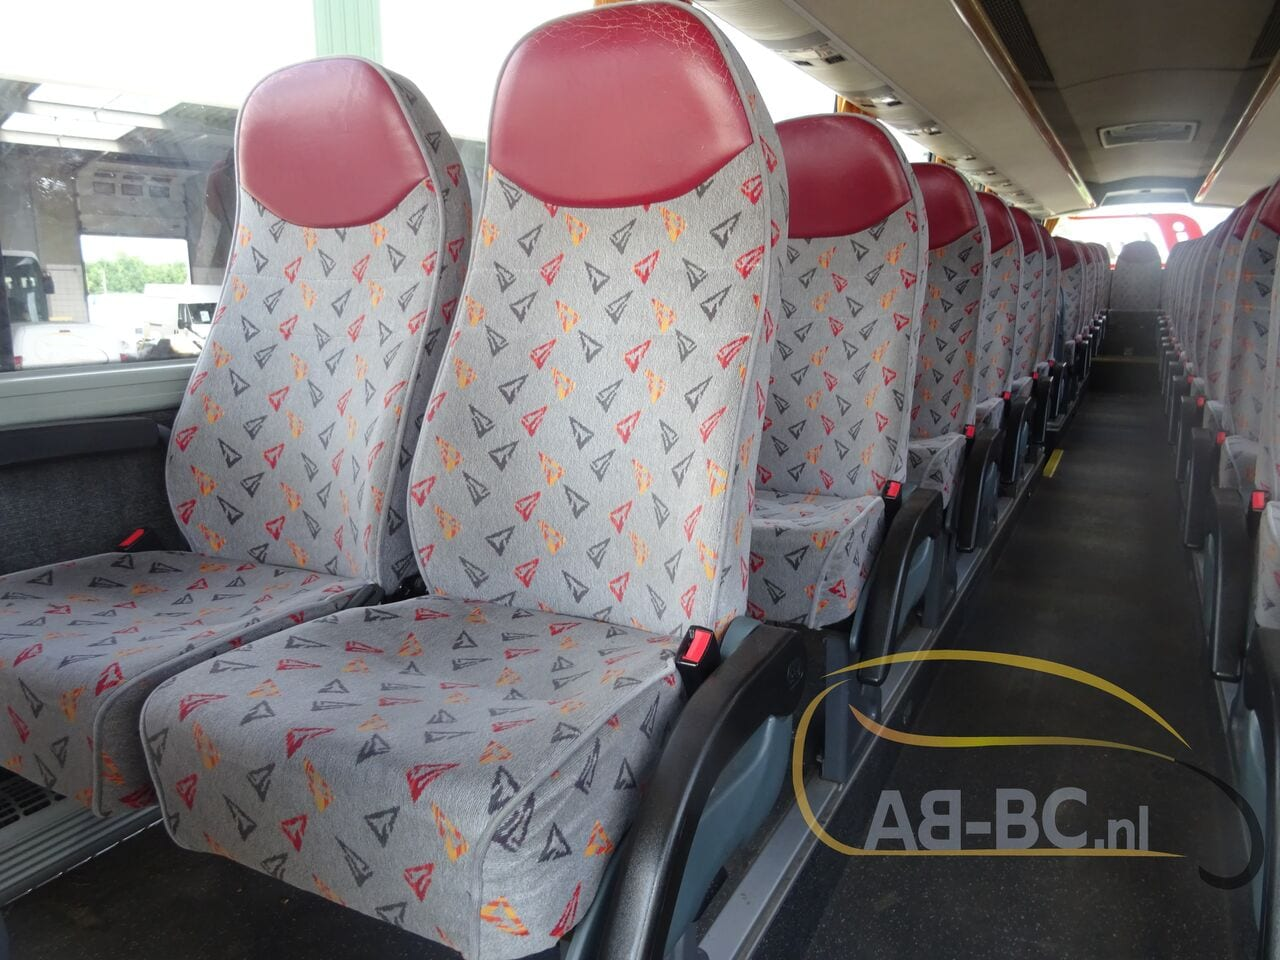 coach-busTEMSA-Safari-RD-DAF-Motor-53-Seats-Euro-5---1623932498254868183_big_11979c9caf1b81e3968f7b0dff622f6f--21061715155620919600